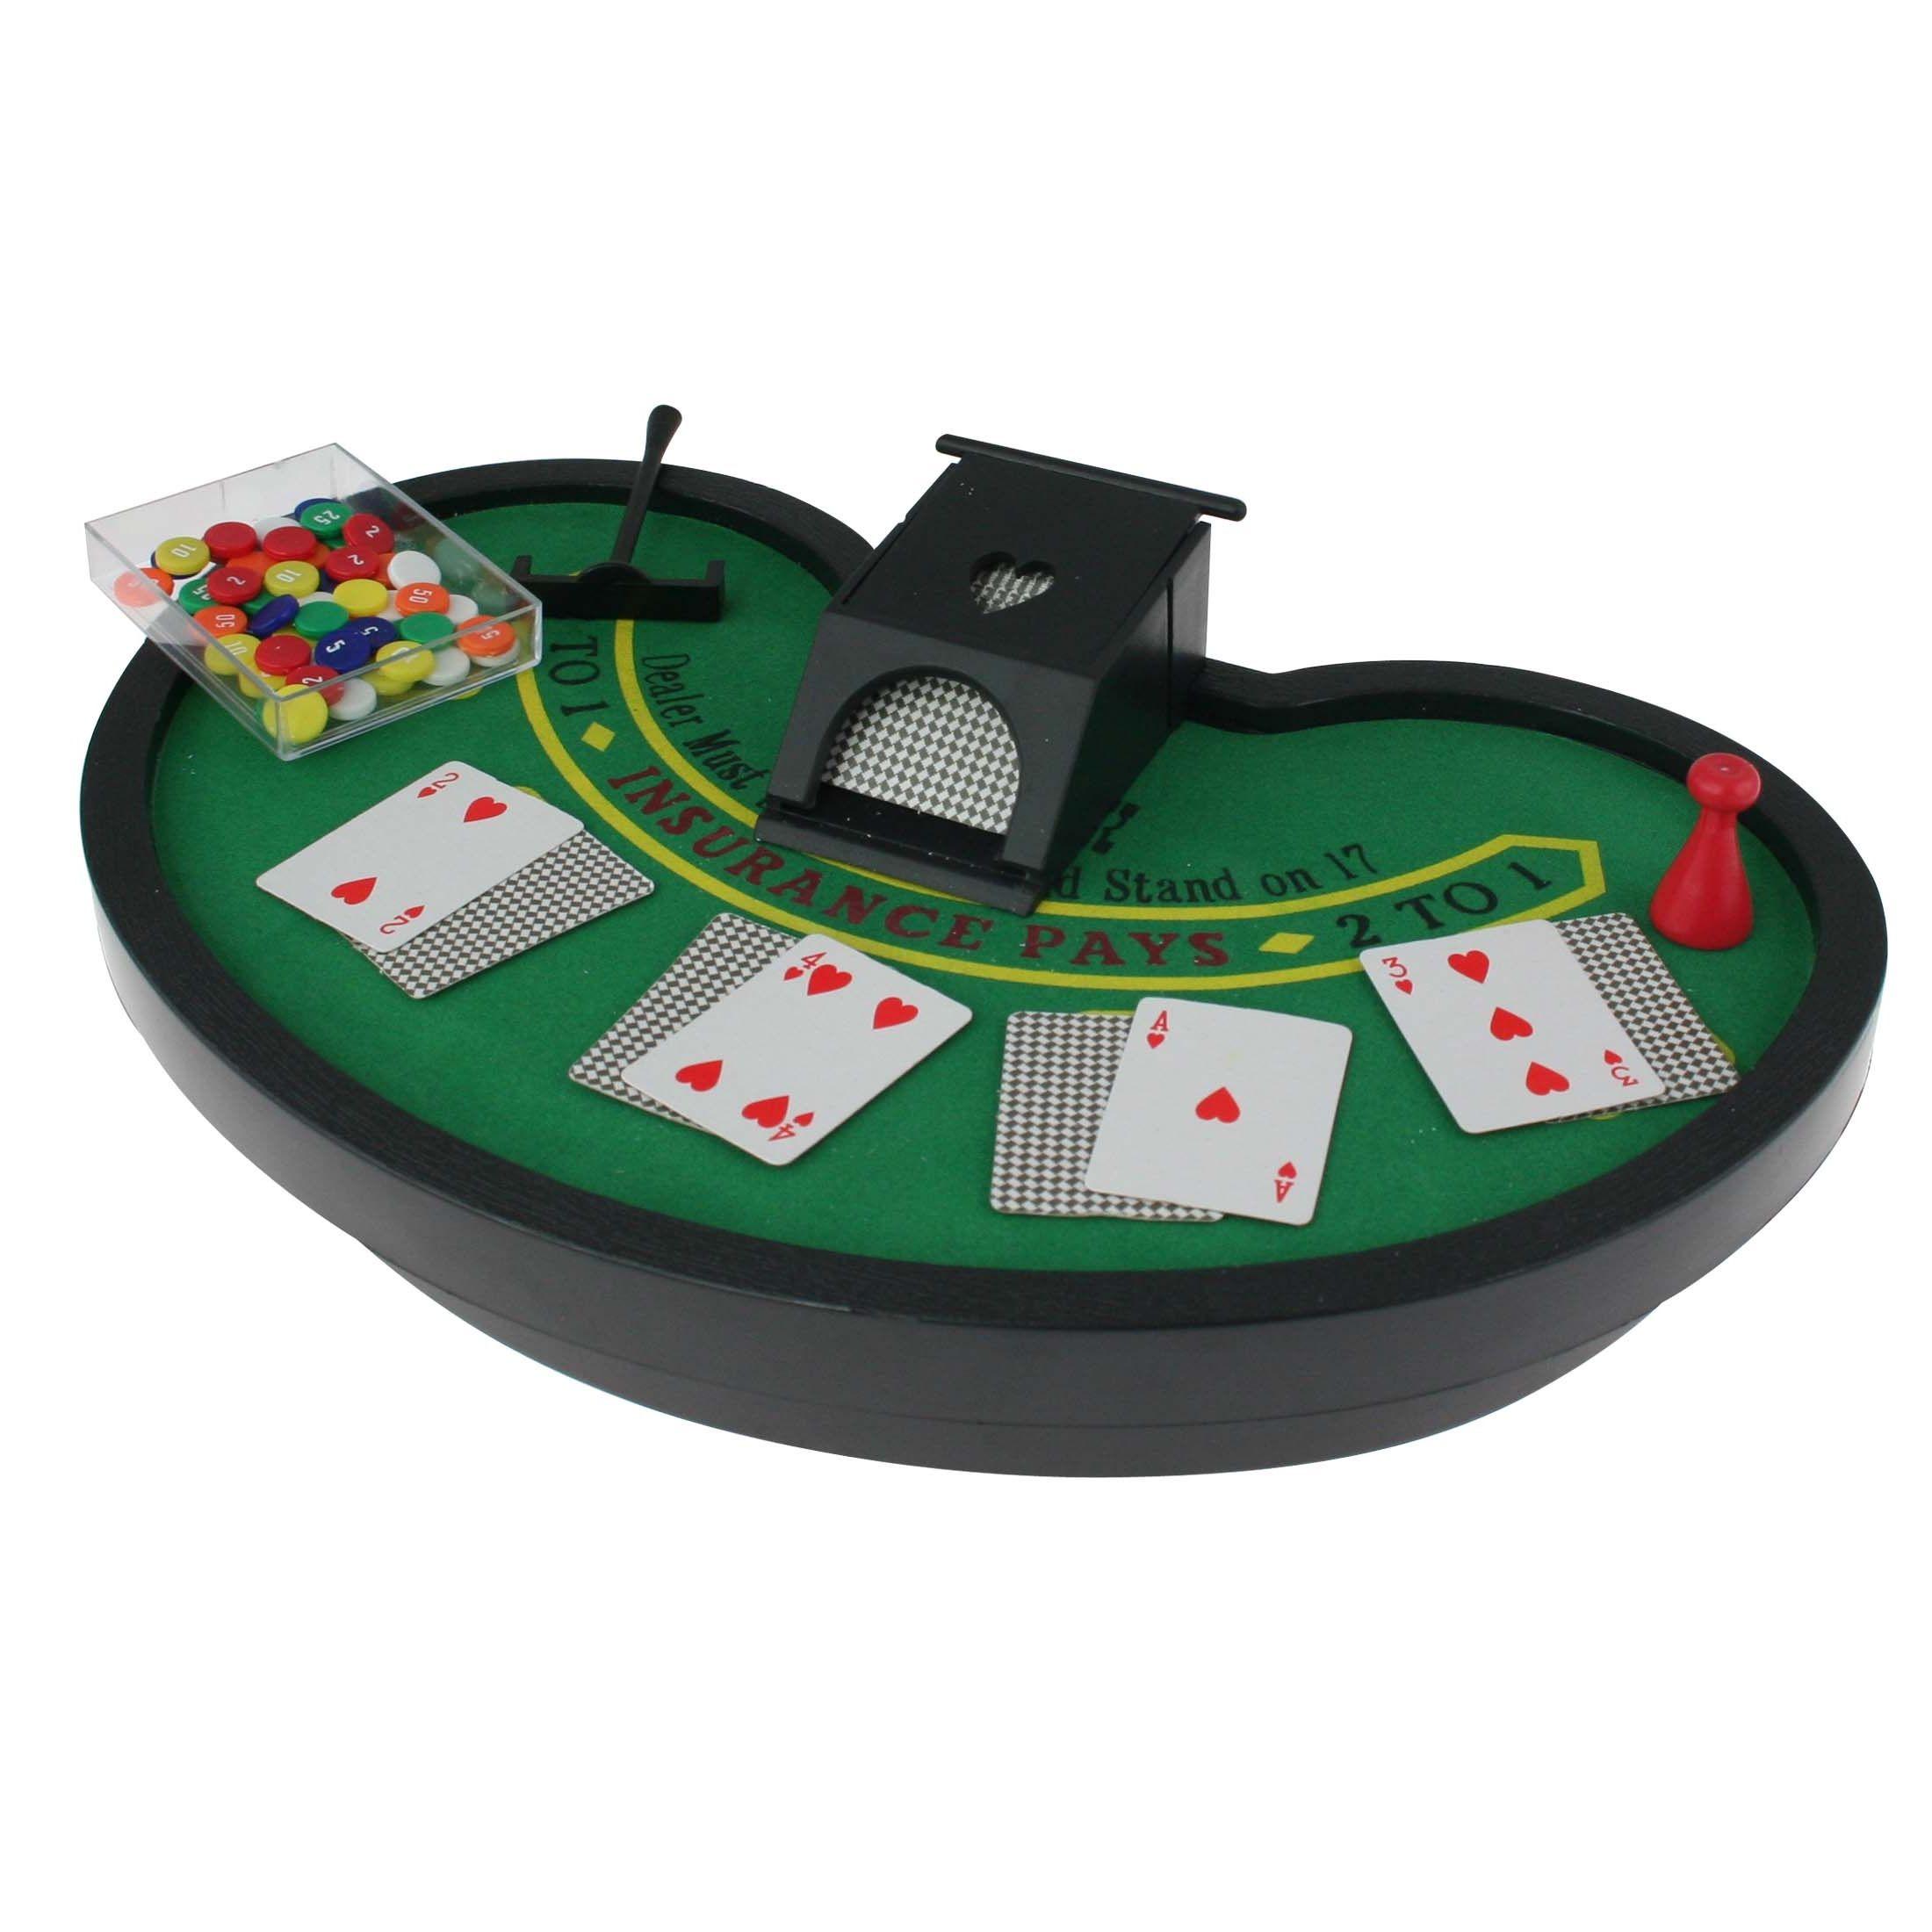 Messina poker